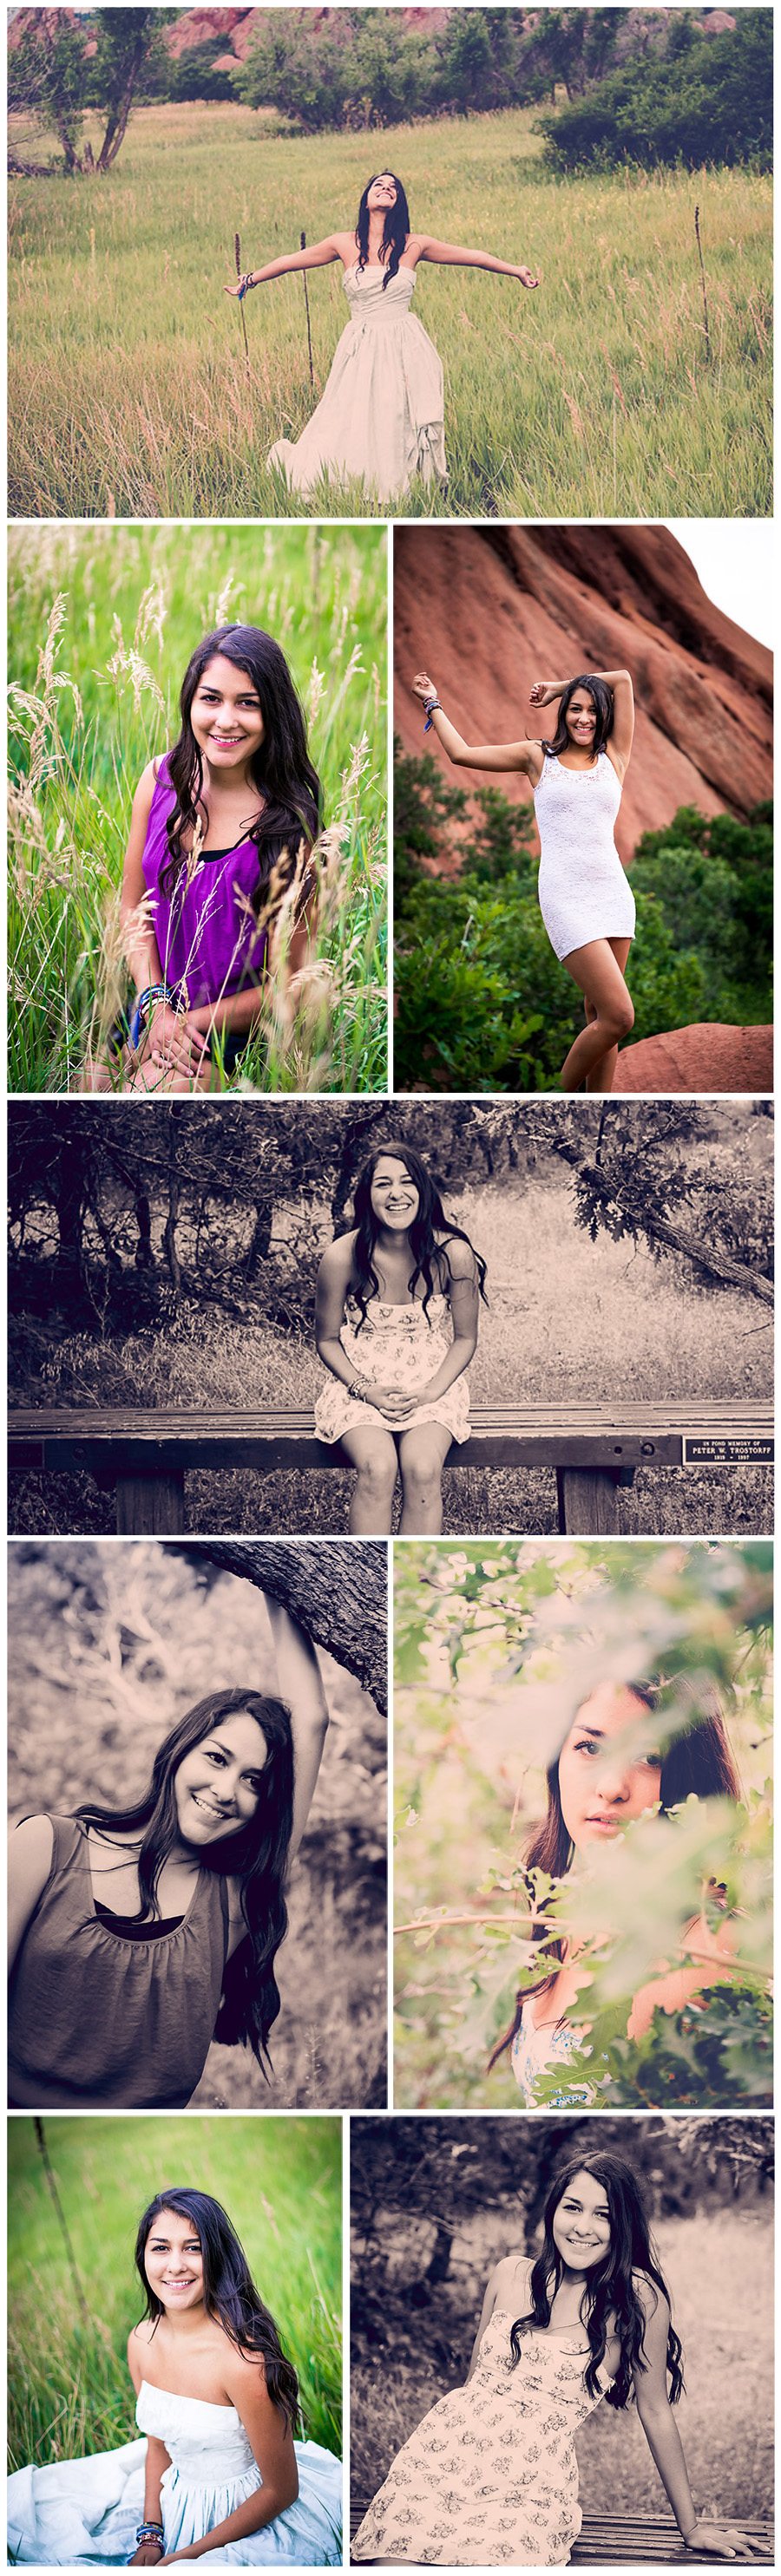 East High School Senior Pictures Jasmine Collage 3